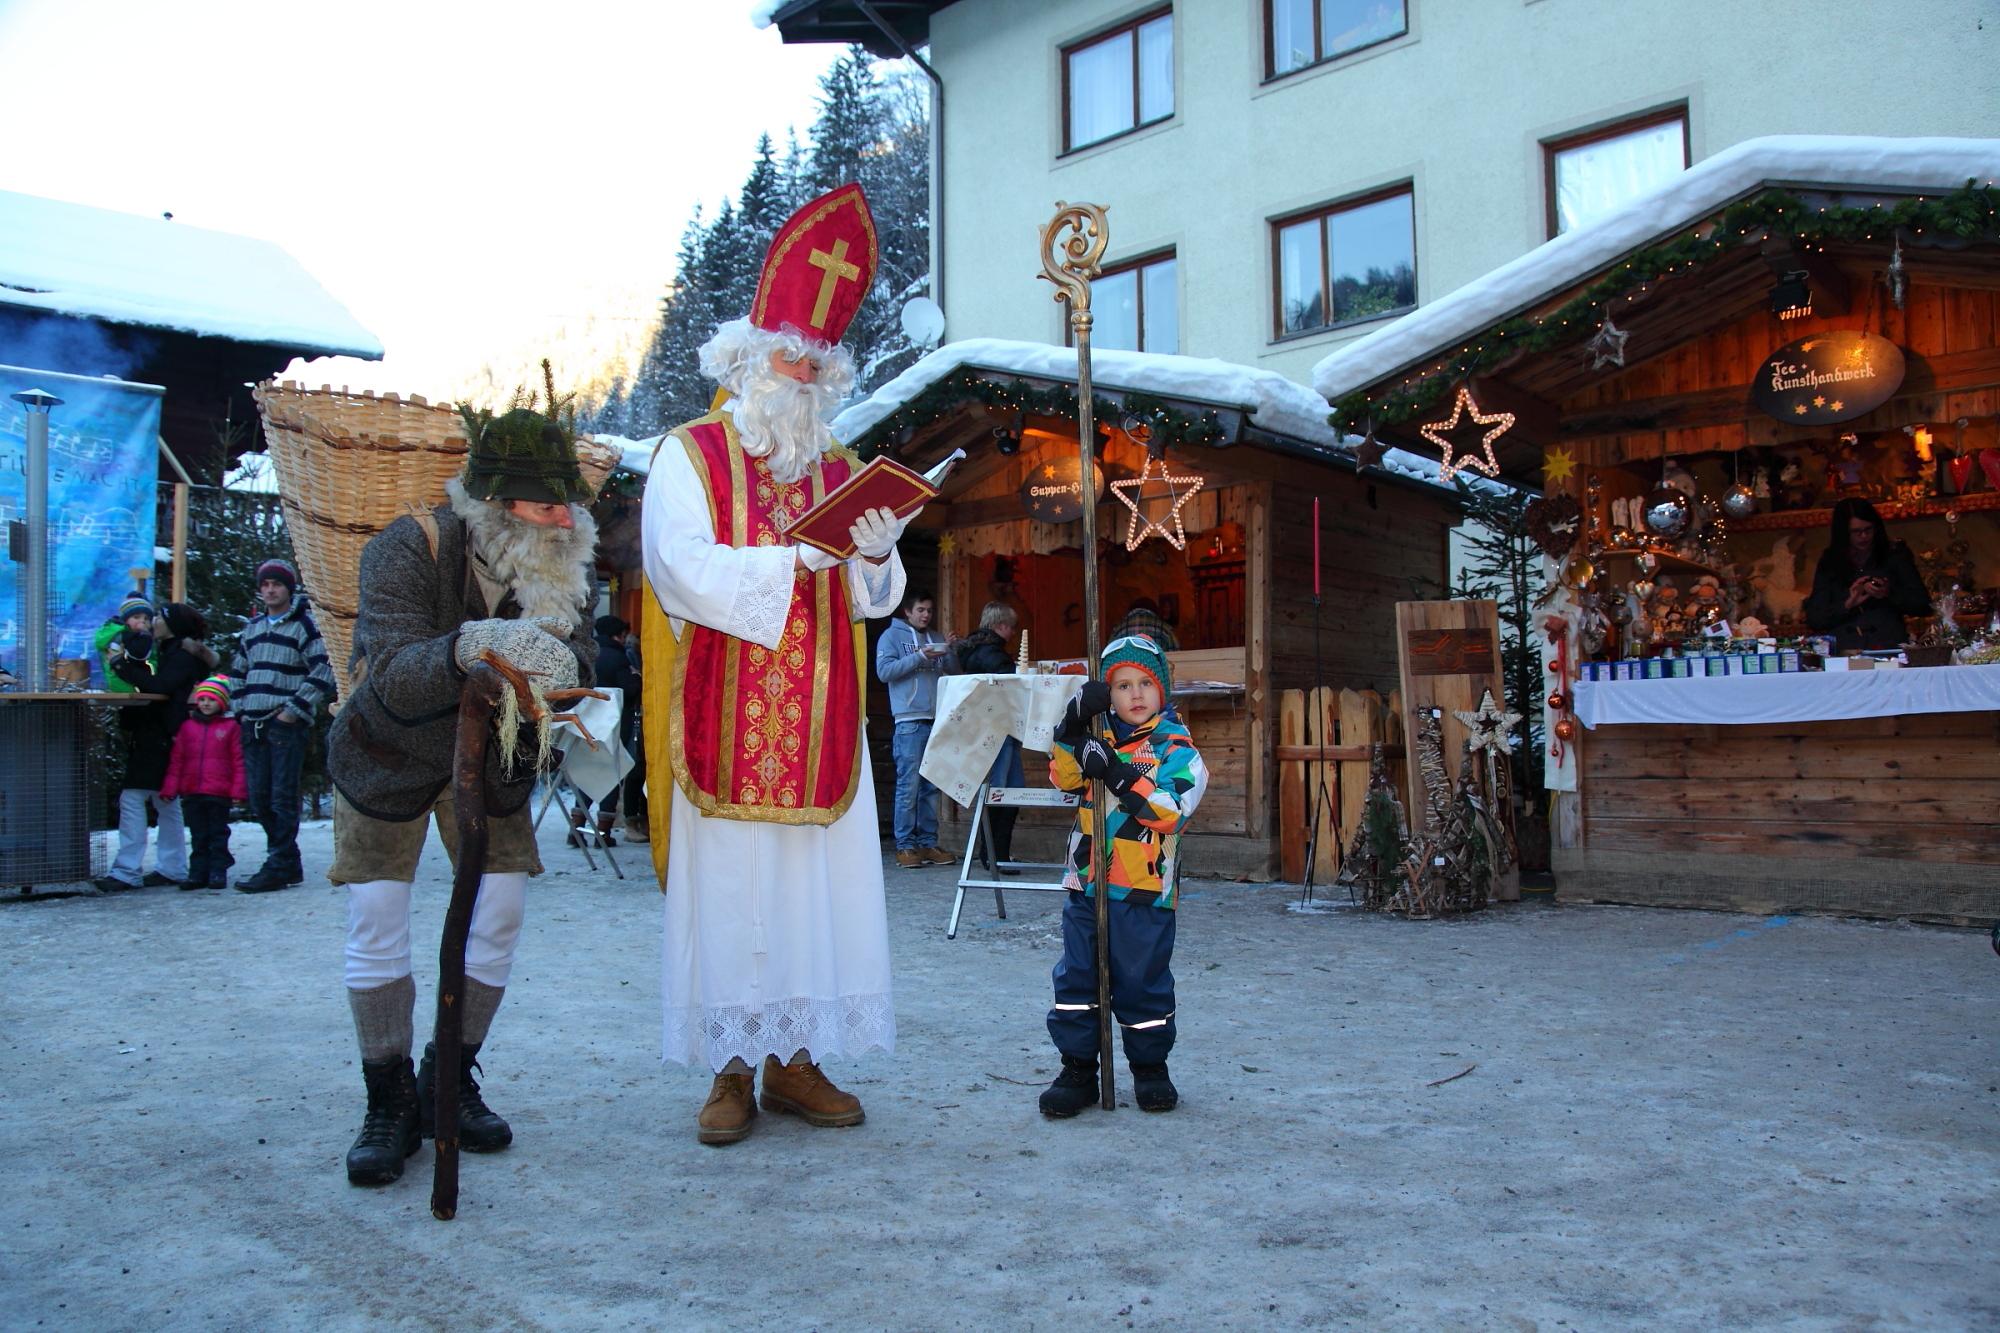 Serata di San Nikolaus a Grossarl